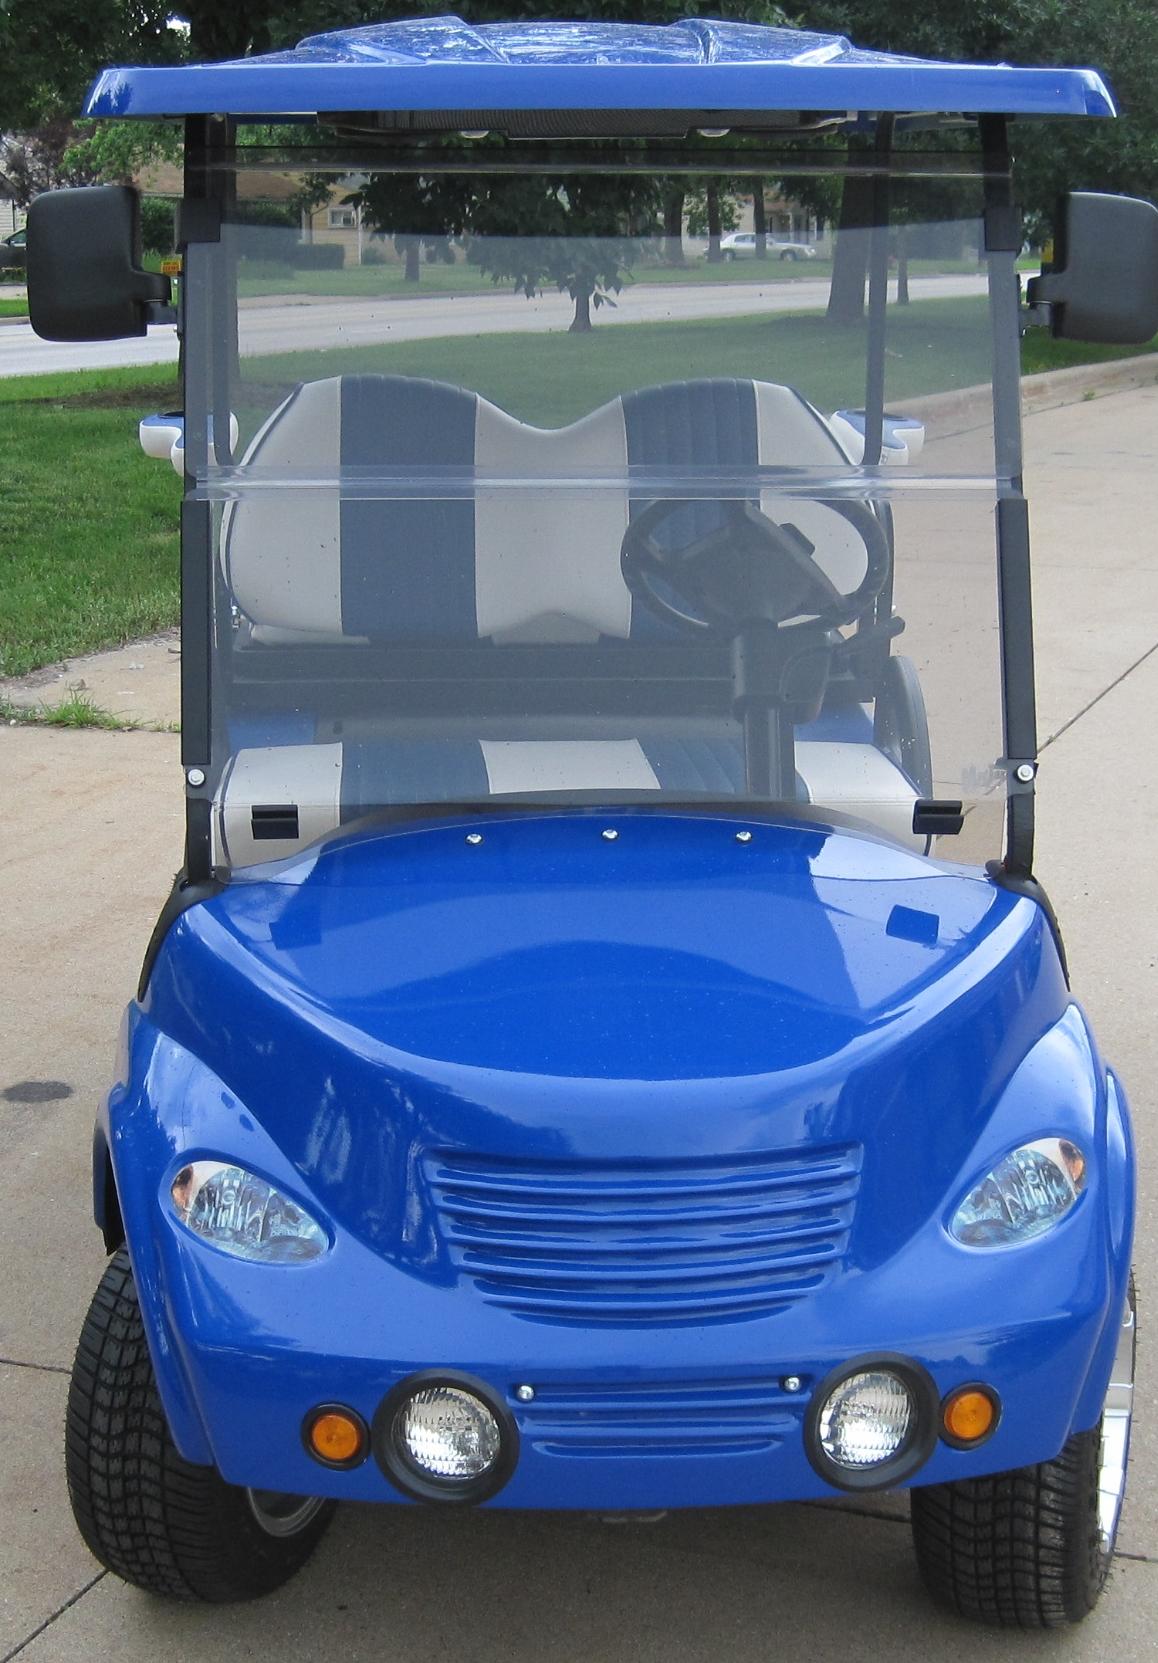 pt cruiser custom ezgo golf cart. Black Bedroom Furniture Sets. Home Design Ideas